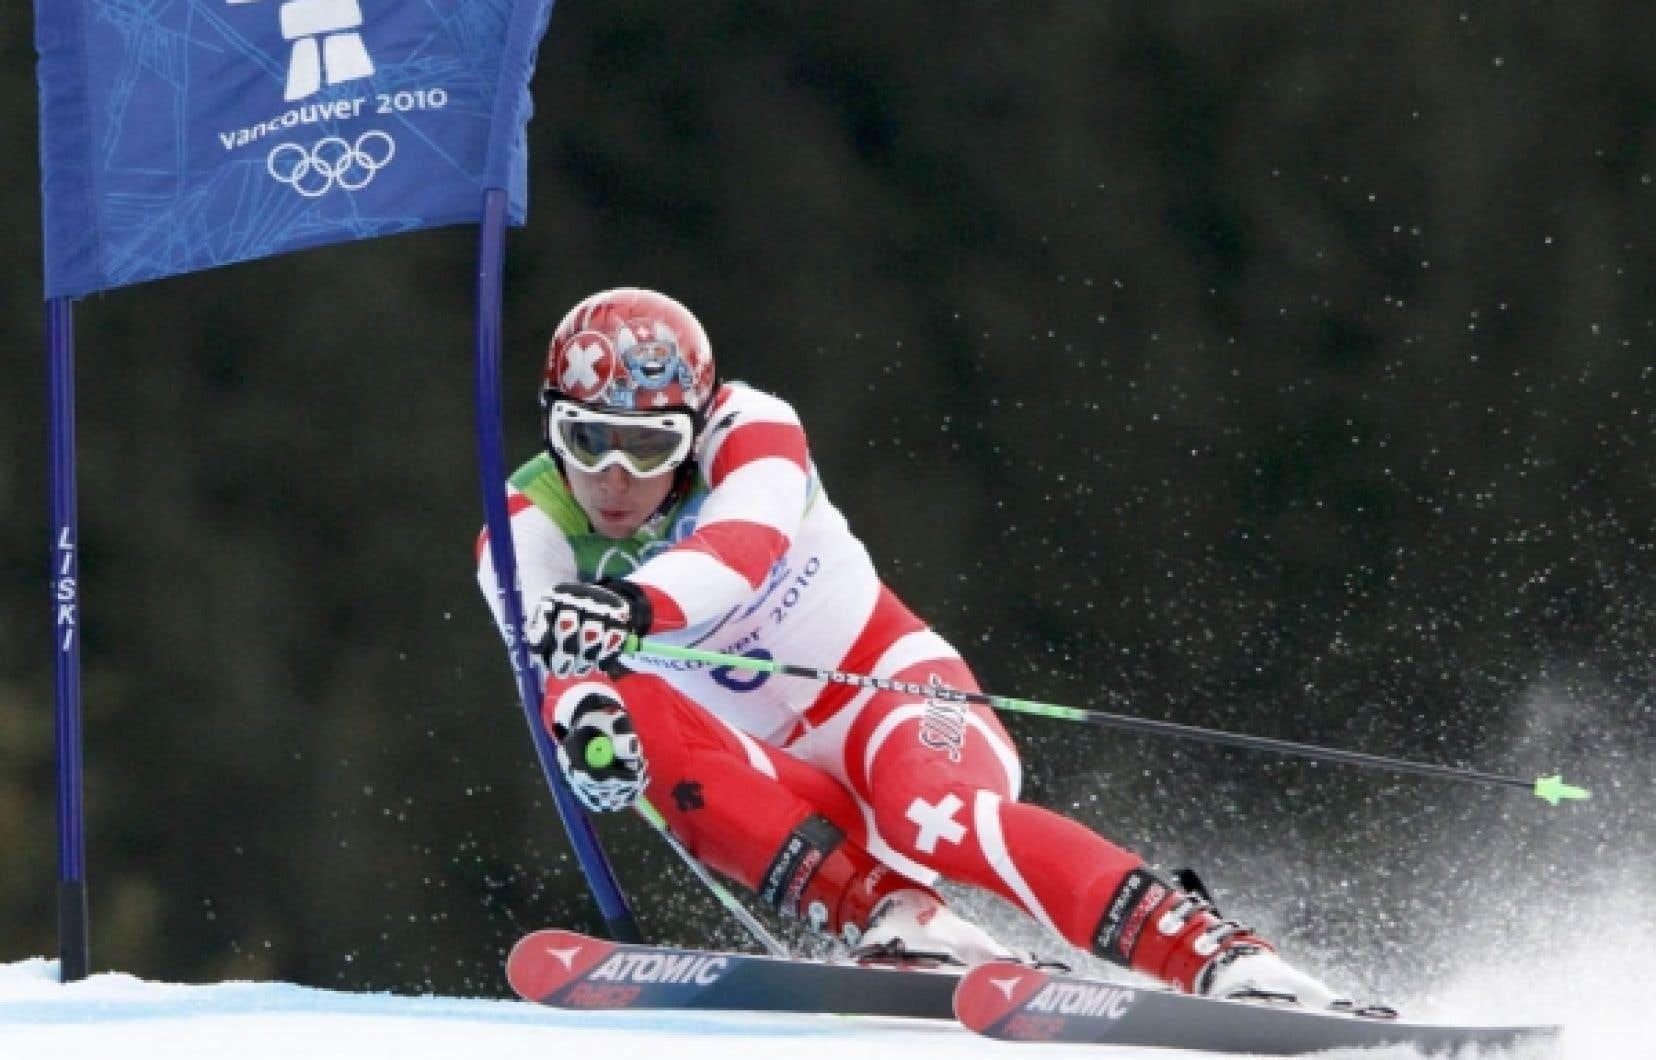 Le Suisse Carlo Janka